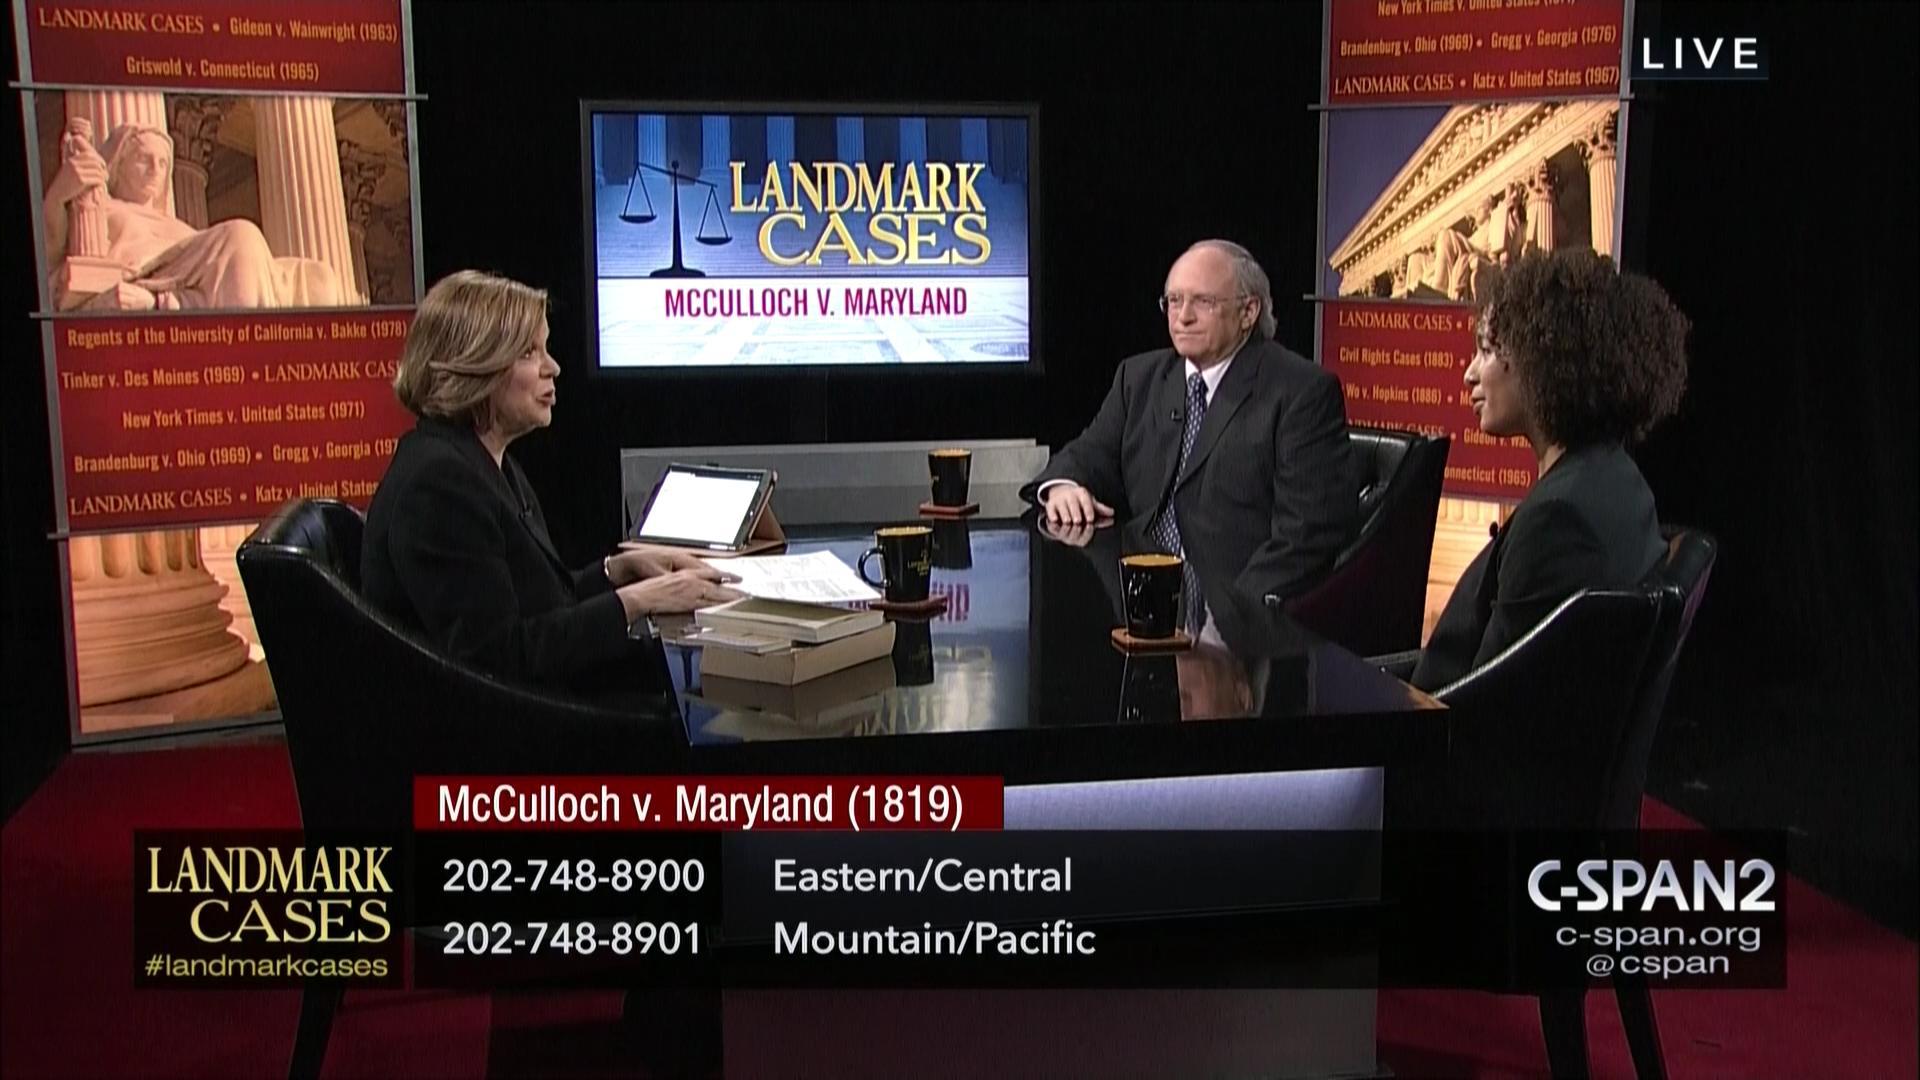 Supreme Court Landmark Case McCulloch Maryland, Feb 26 2018 | Video |  C-SPAN.org